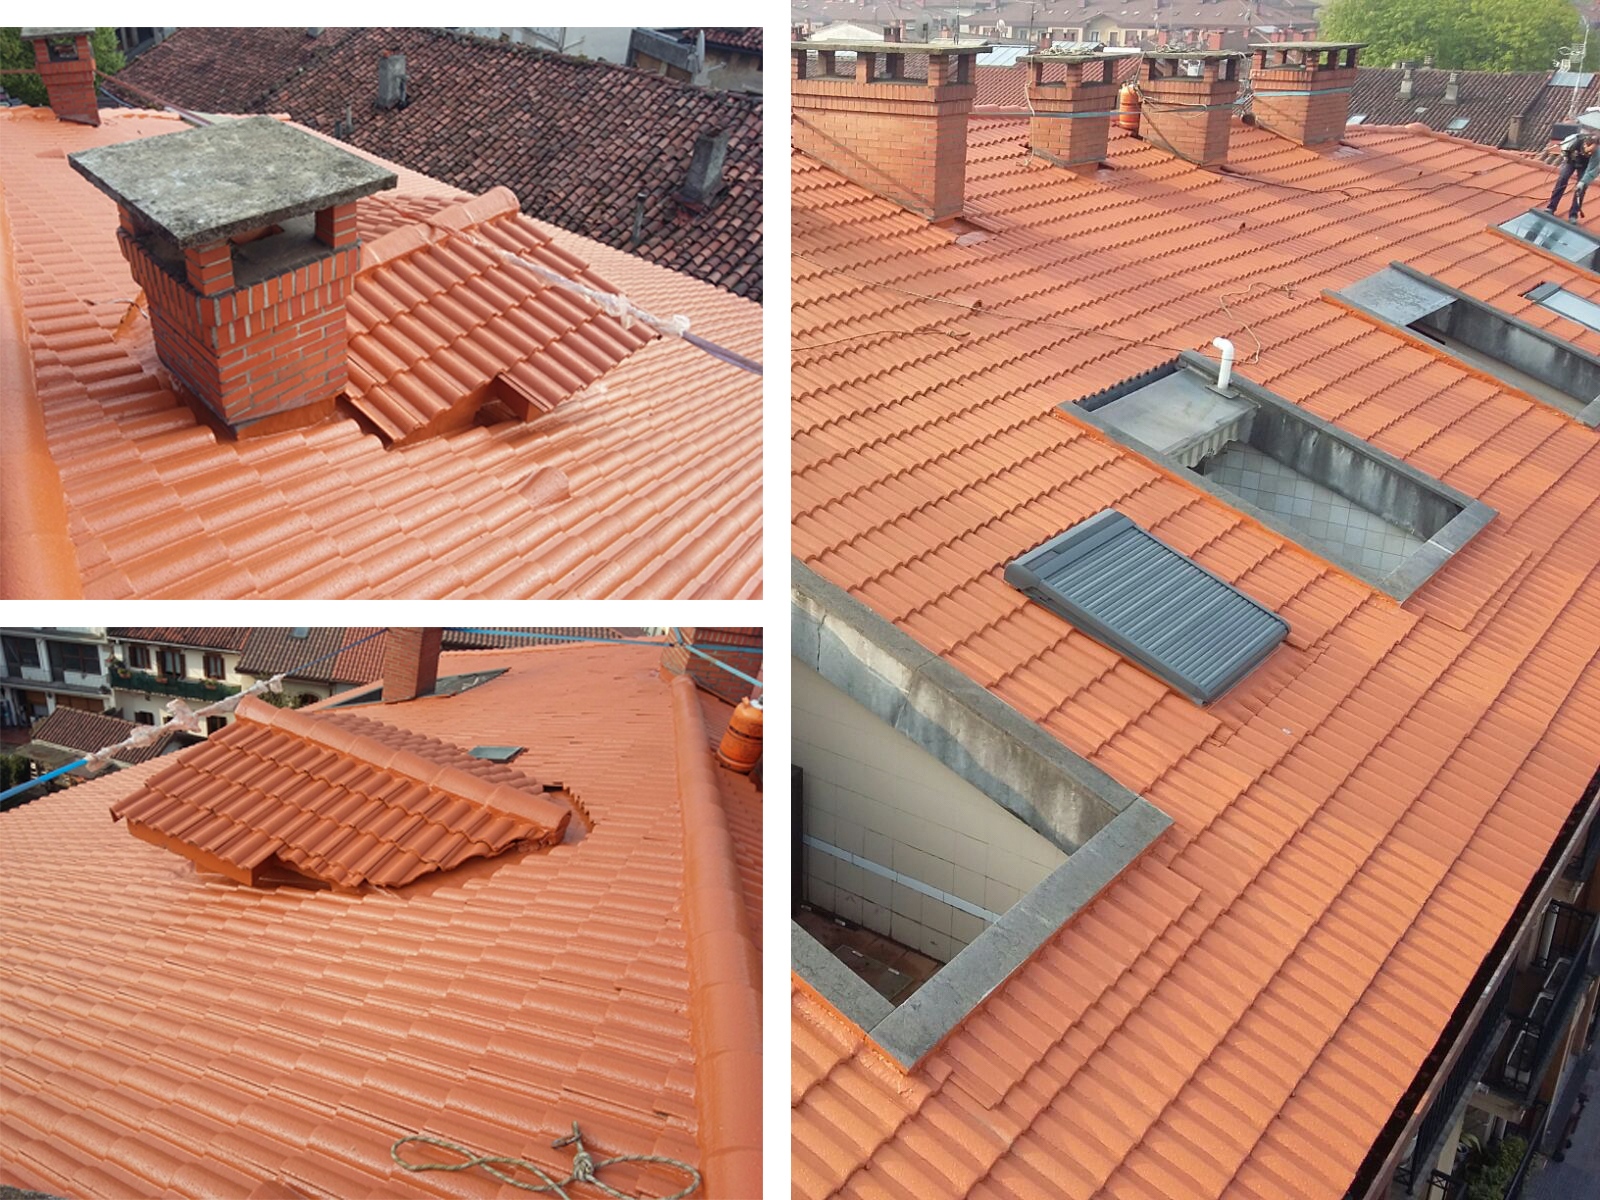 Aislamiento e impermeabilización de tejado